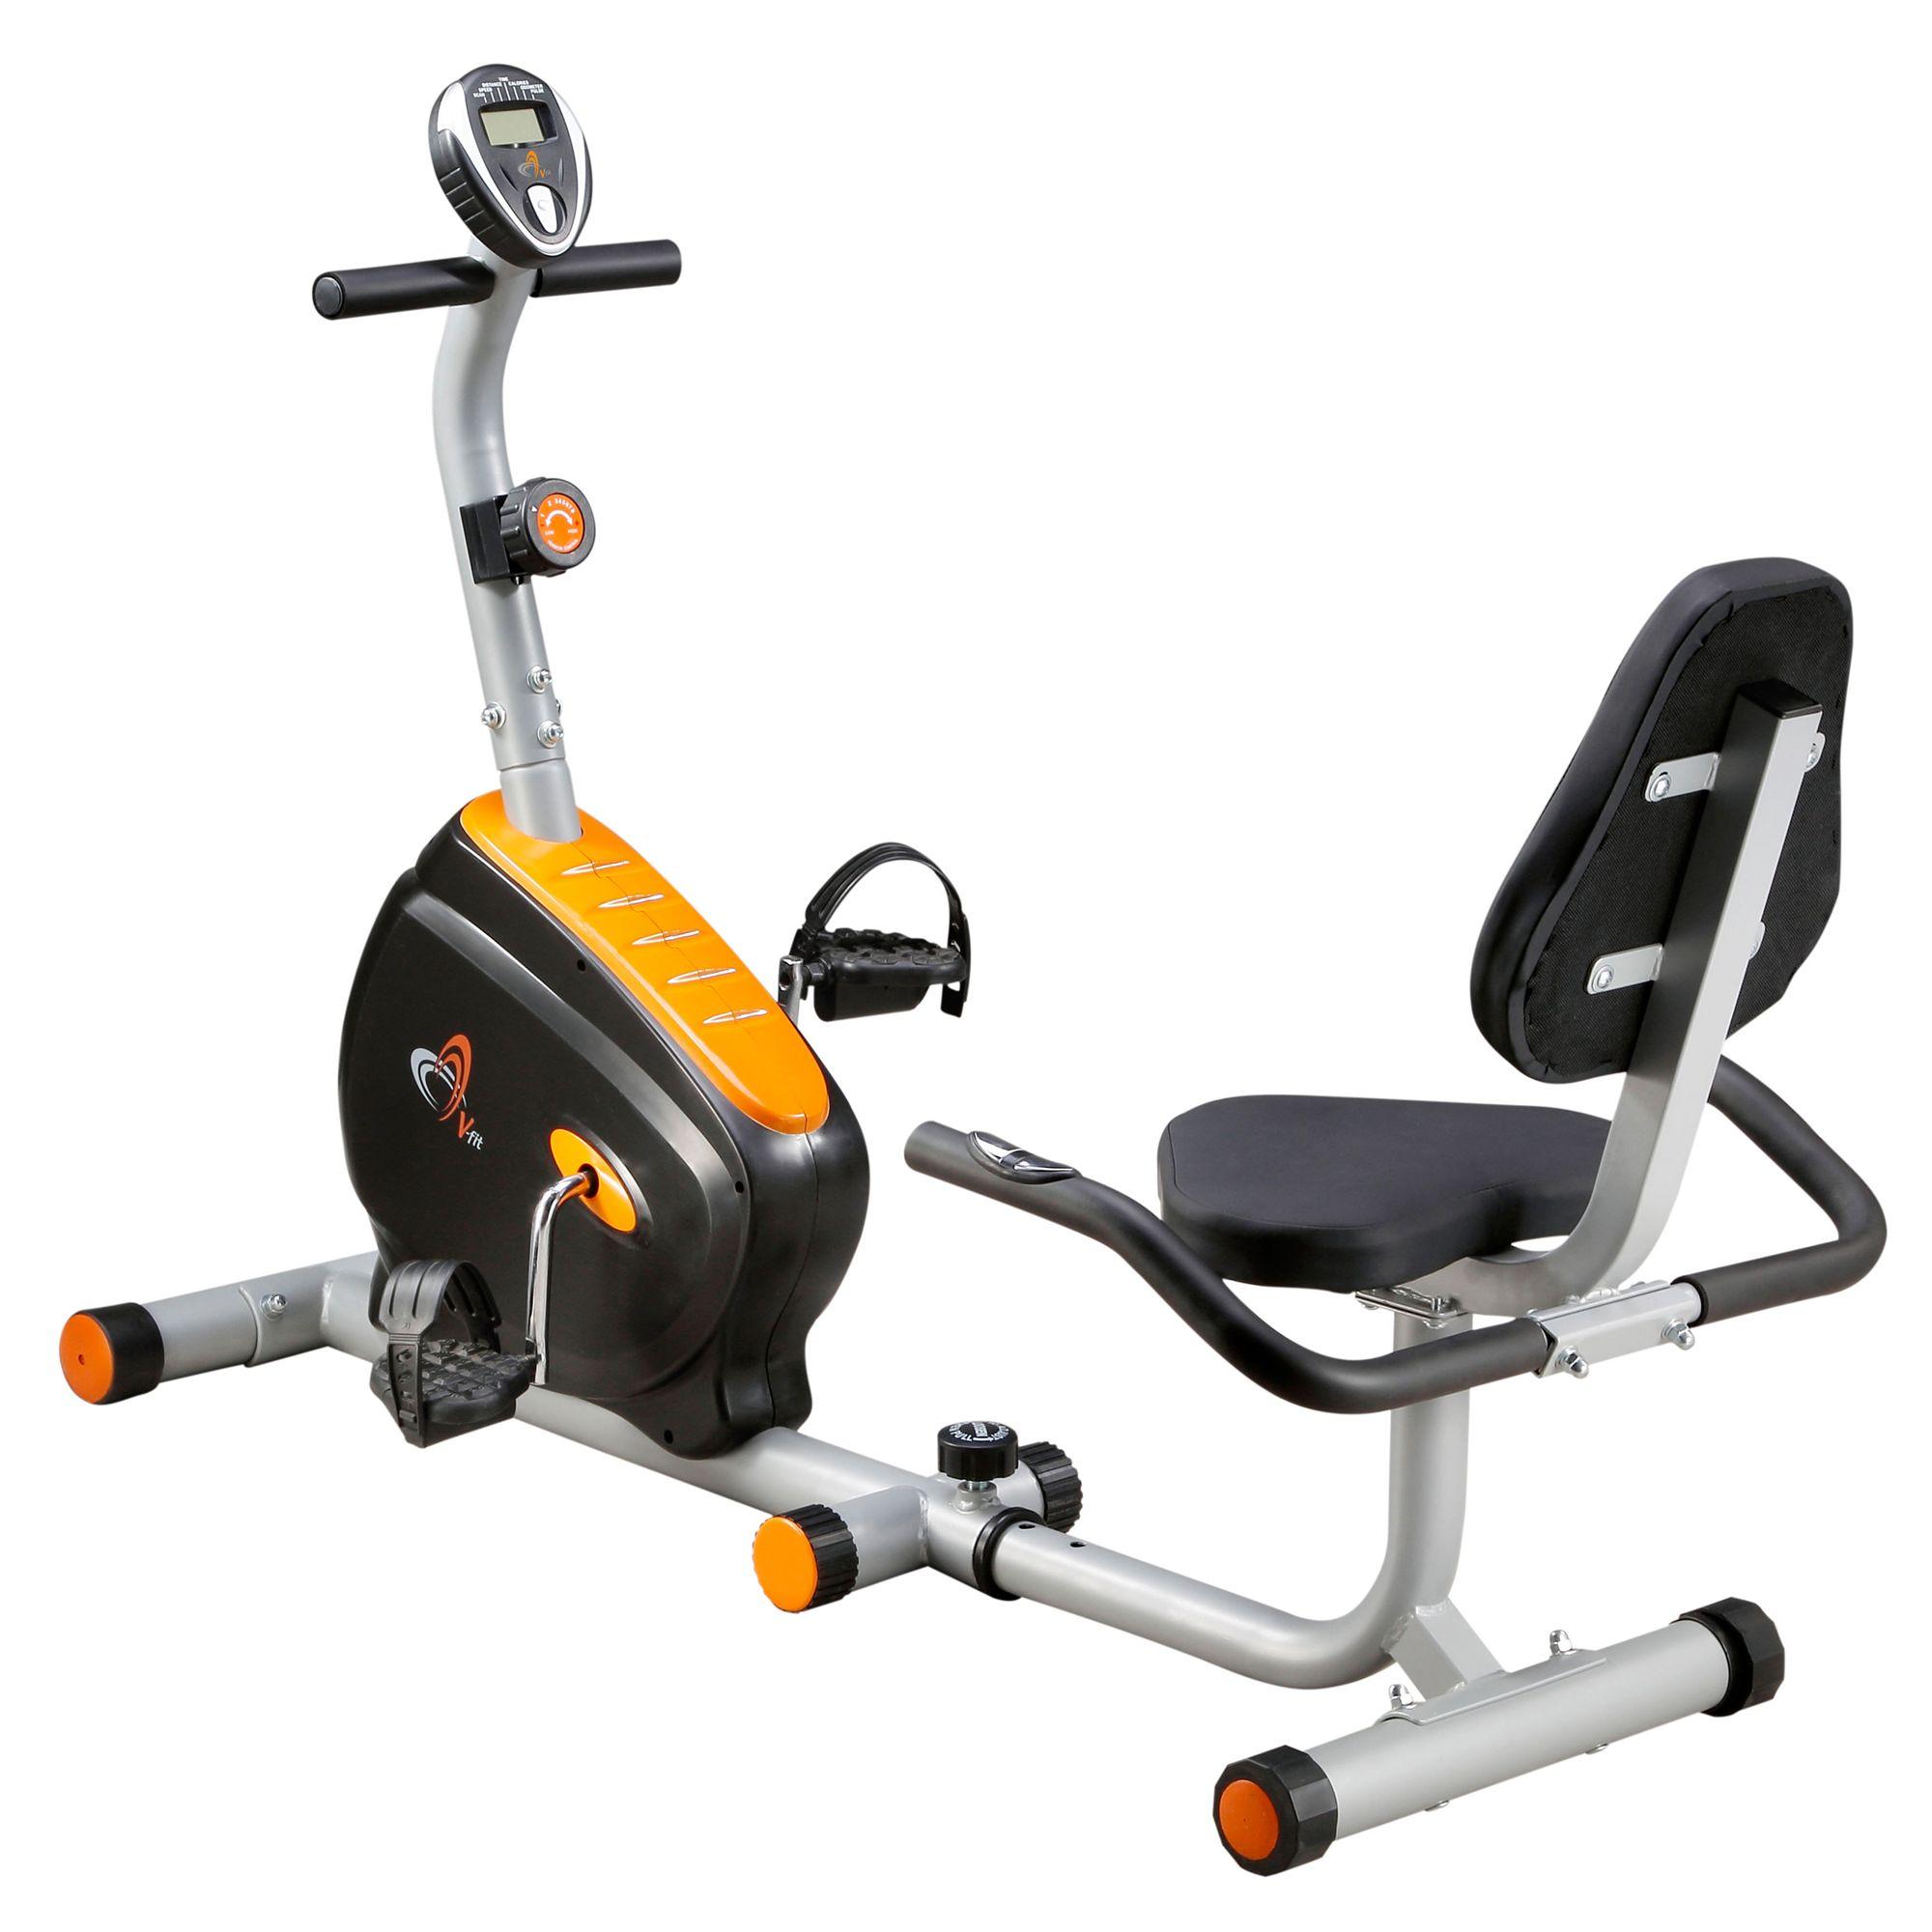 V-fit BK Series RC Recumbent Magnetic Exercise Bike